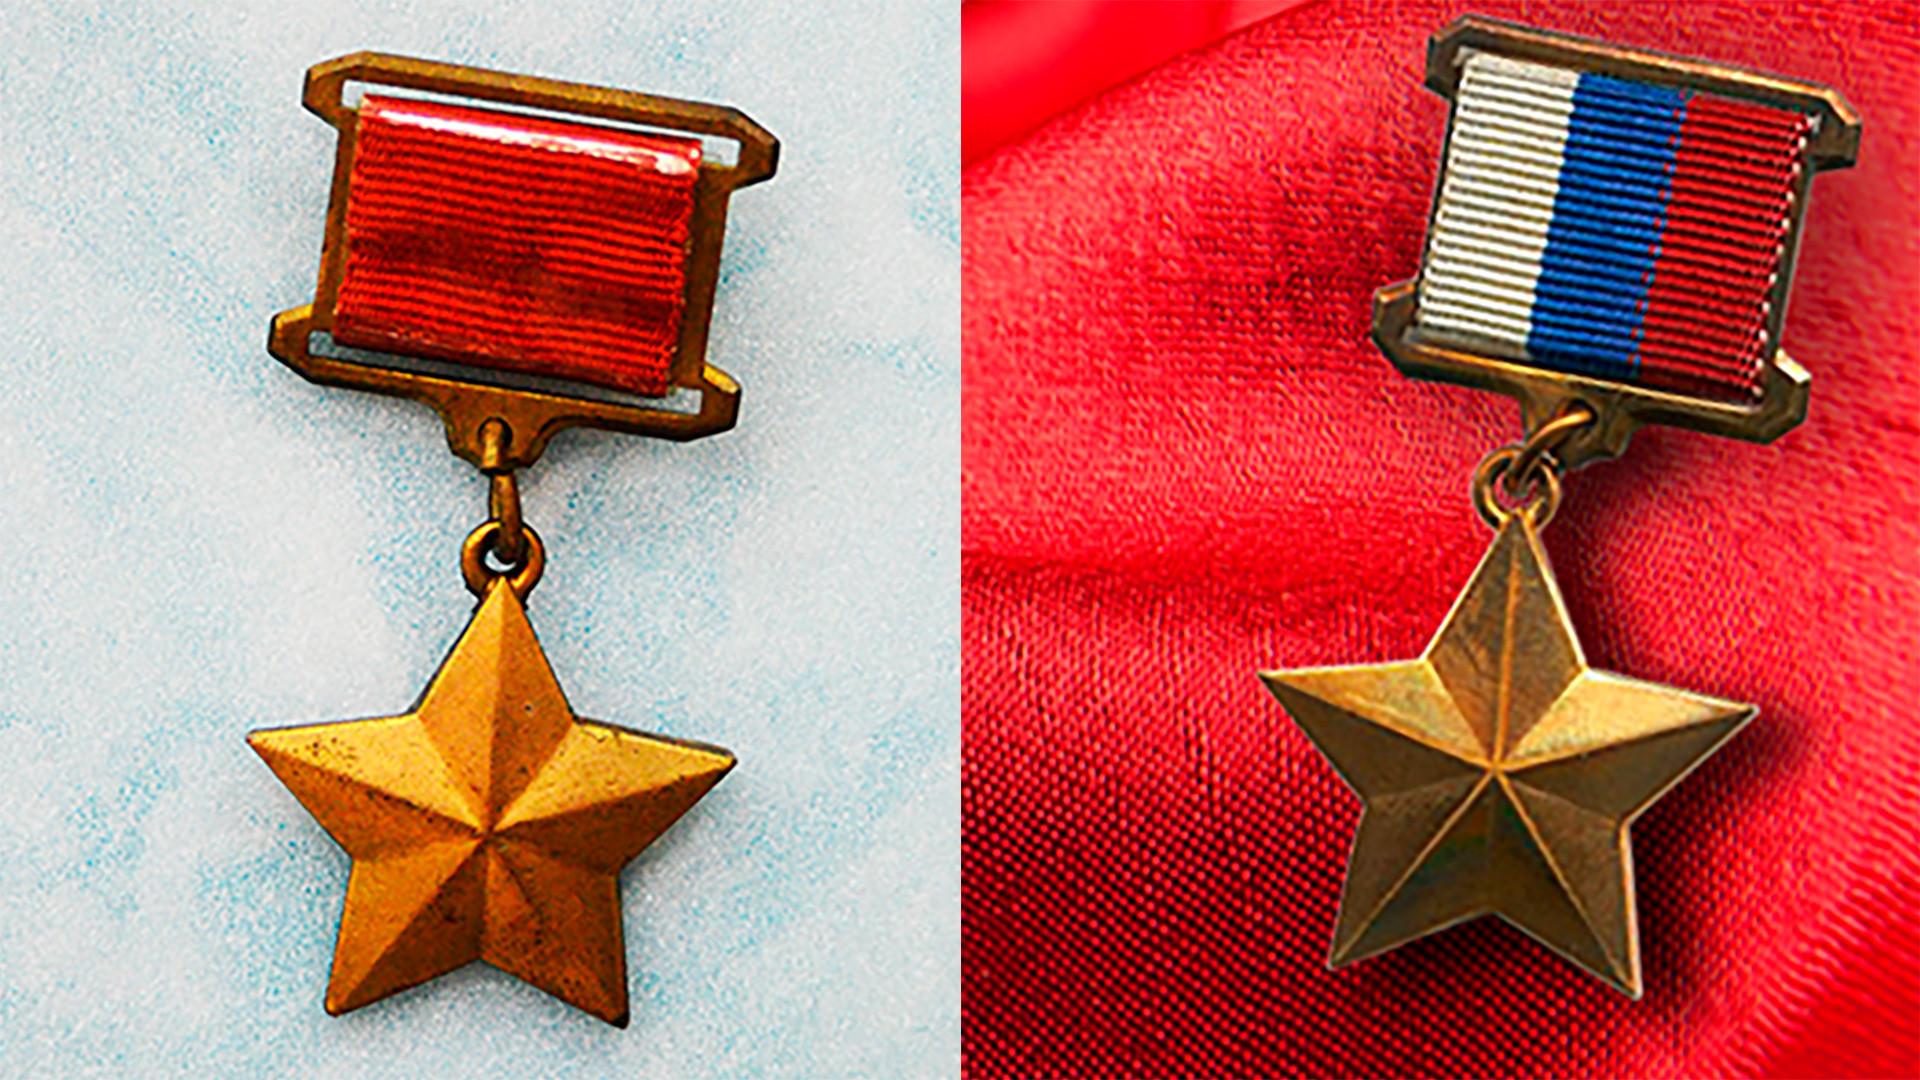 Zlati zvezdi Heroja ZSSR in Heroja Ruske federacije